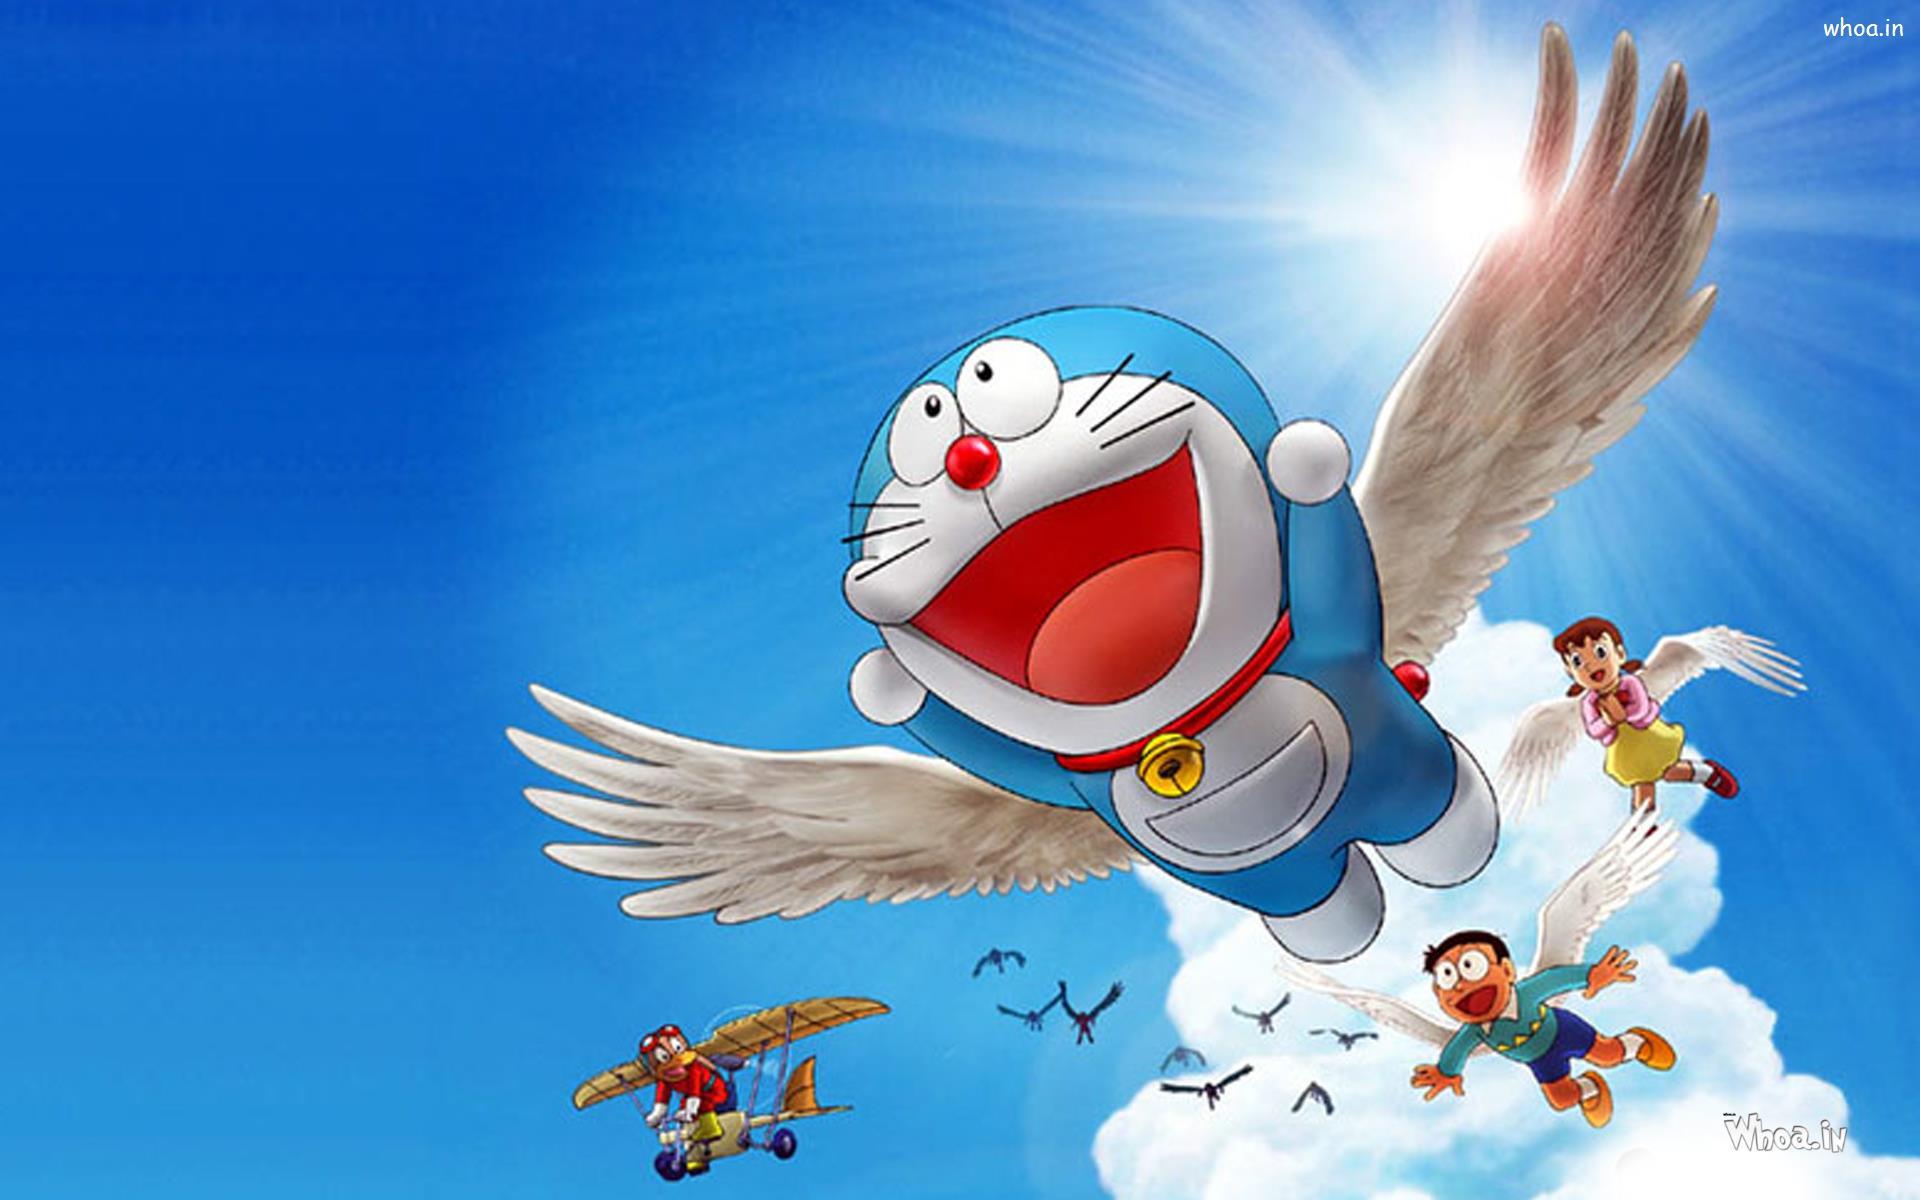 Unduh 58+ Wallpaper Doraemon Pinterest HD Terbaik